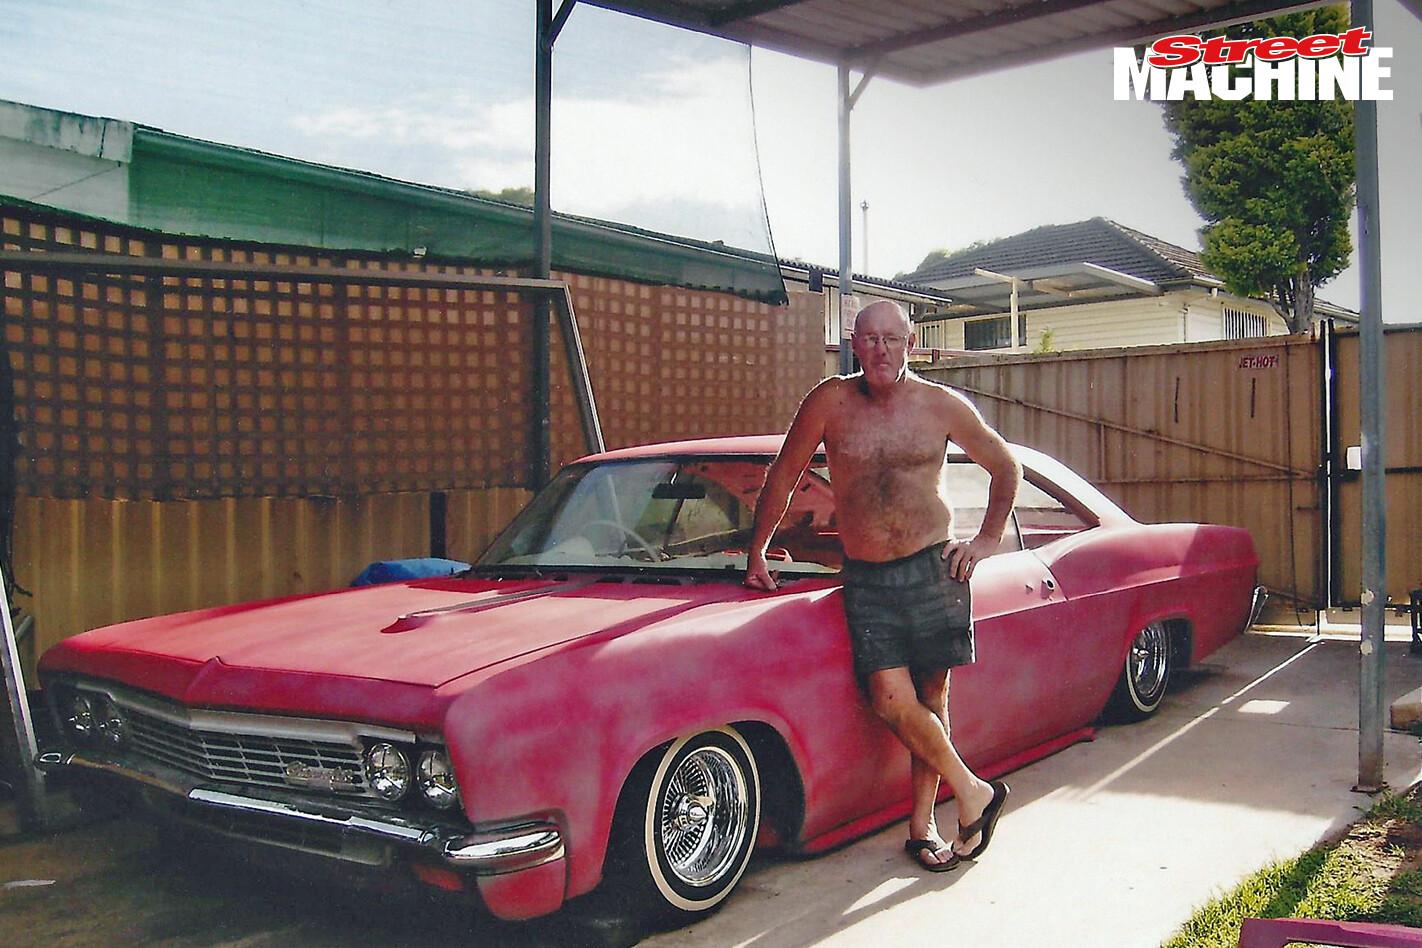 66 Chevy Impala Low